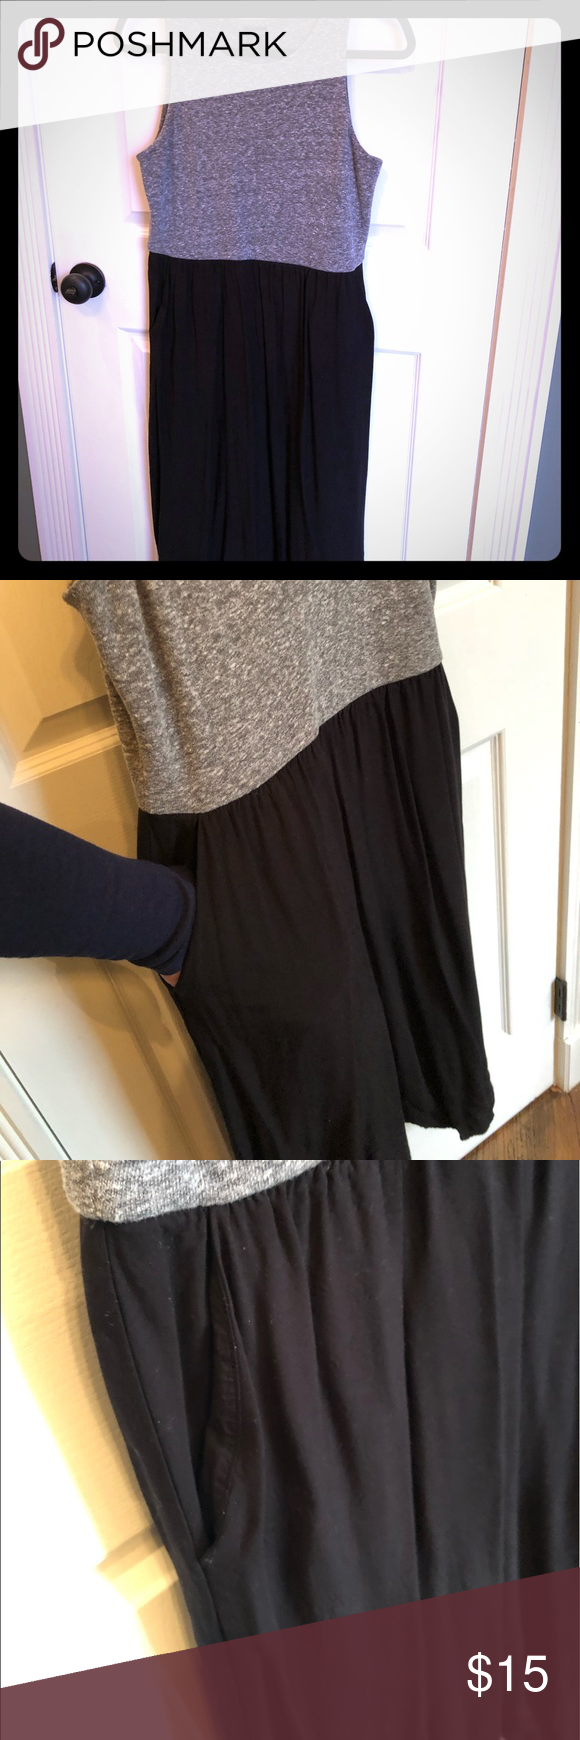 Paraphrase Maxi Dres Grey Black Stretch Pocket M Knit Top Rayon Bottom With Pock Dress